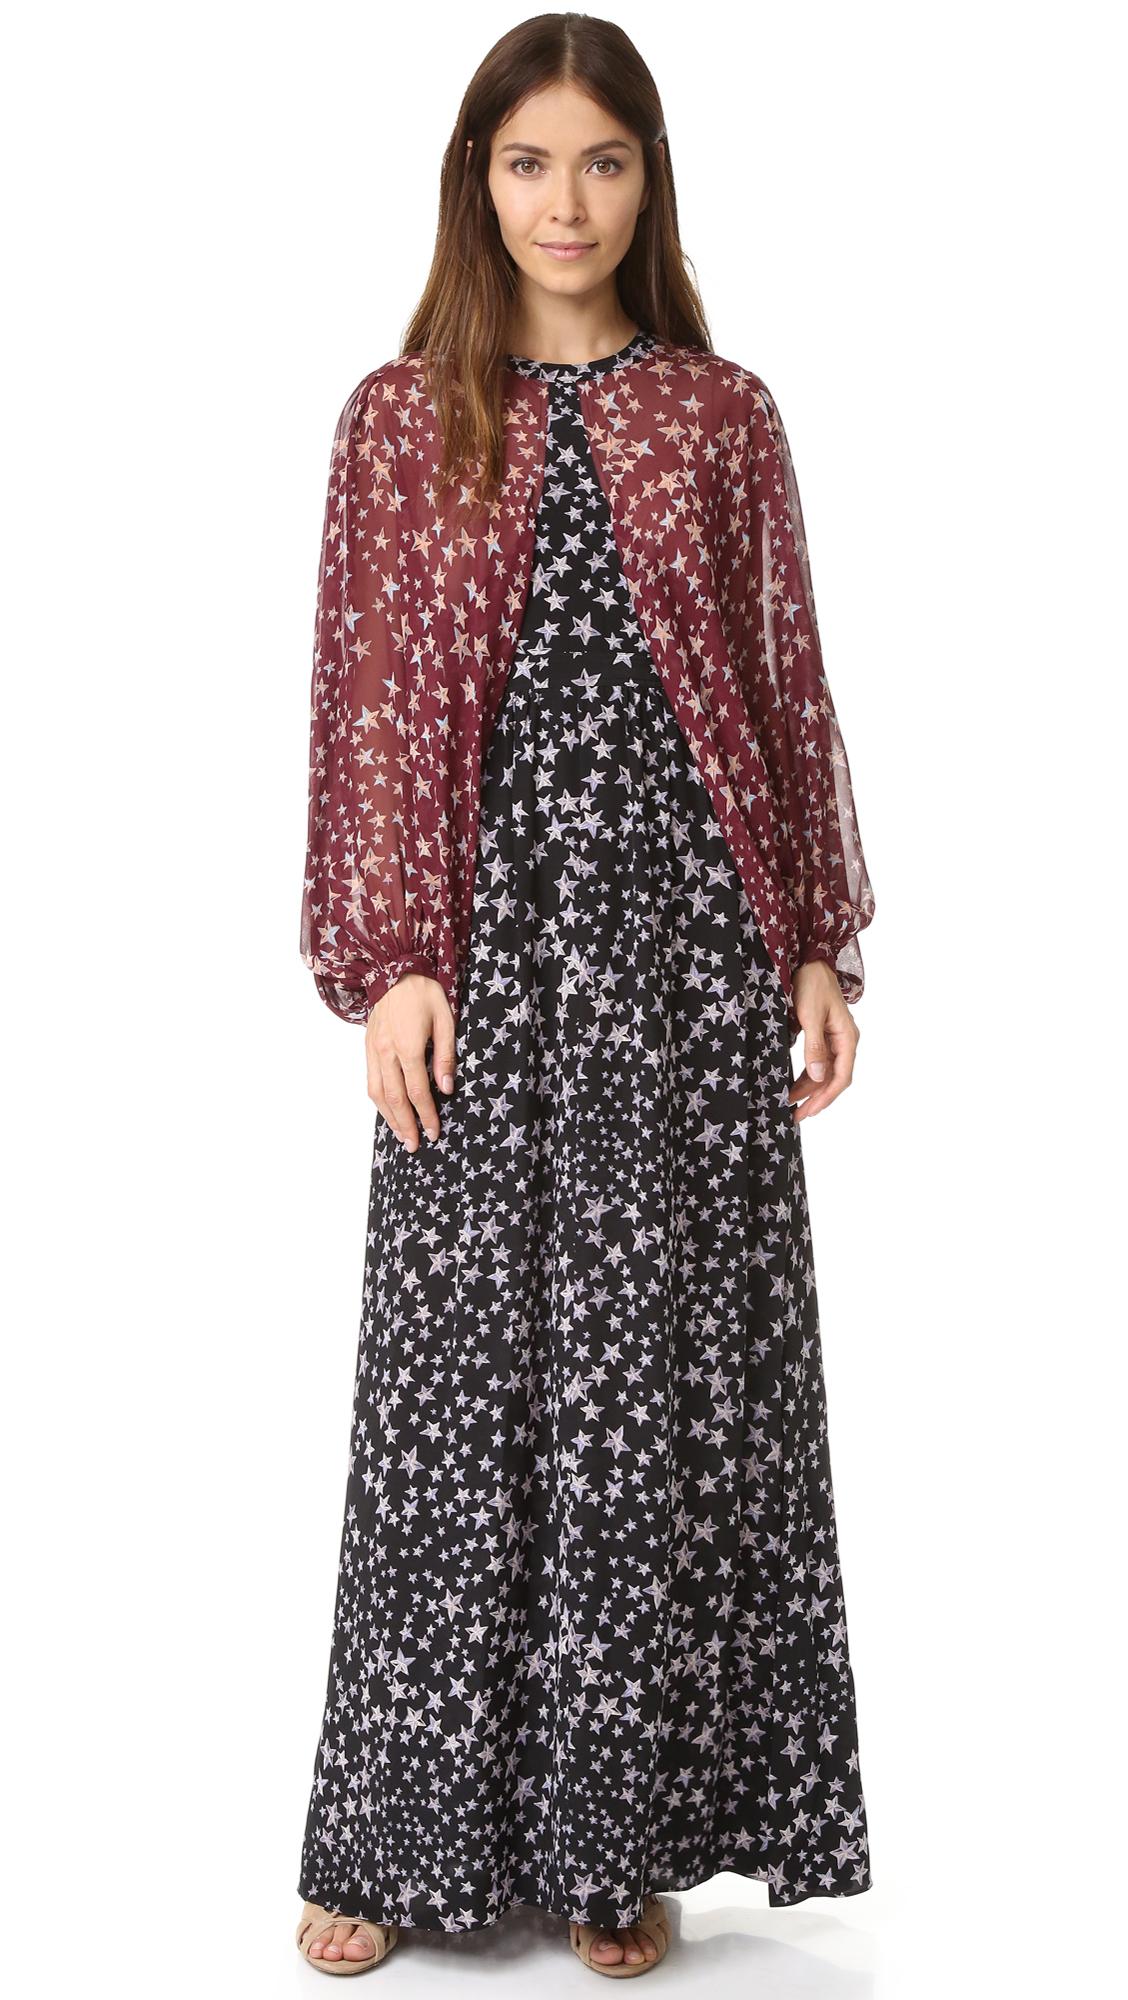 Bcbgmaxazria Linette Long Dress - Black Combo at Shopbop